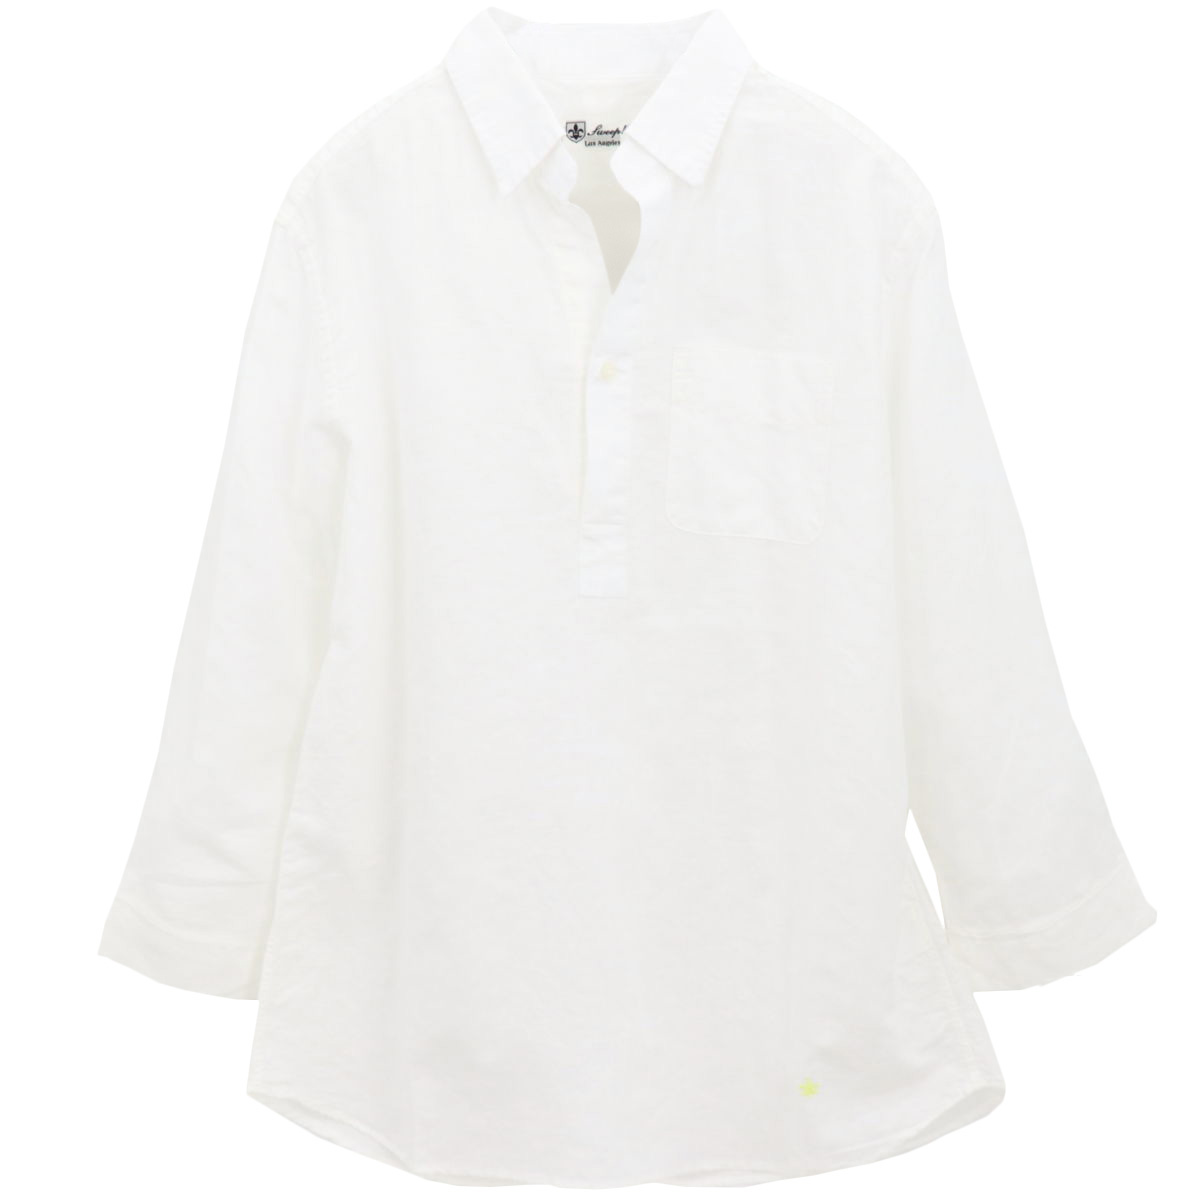 【50%OFF】リネンコットン カプリシャツ WHITE(ホワイト)